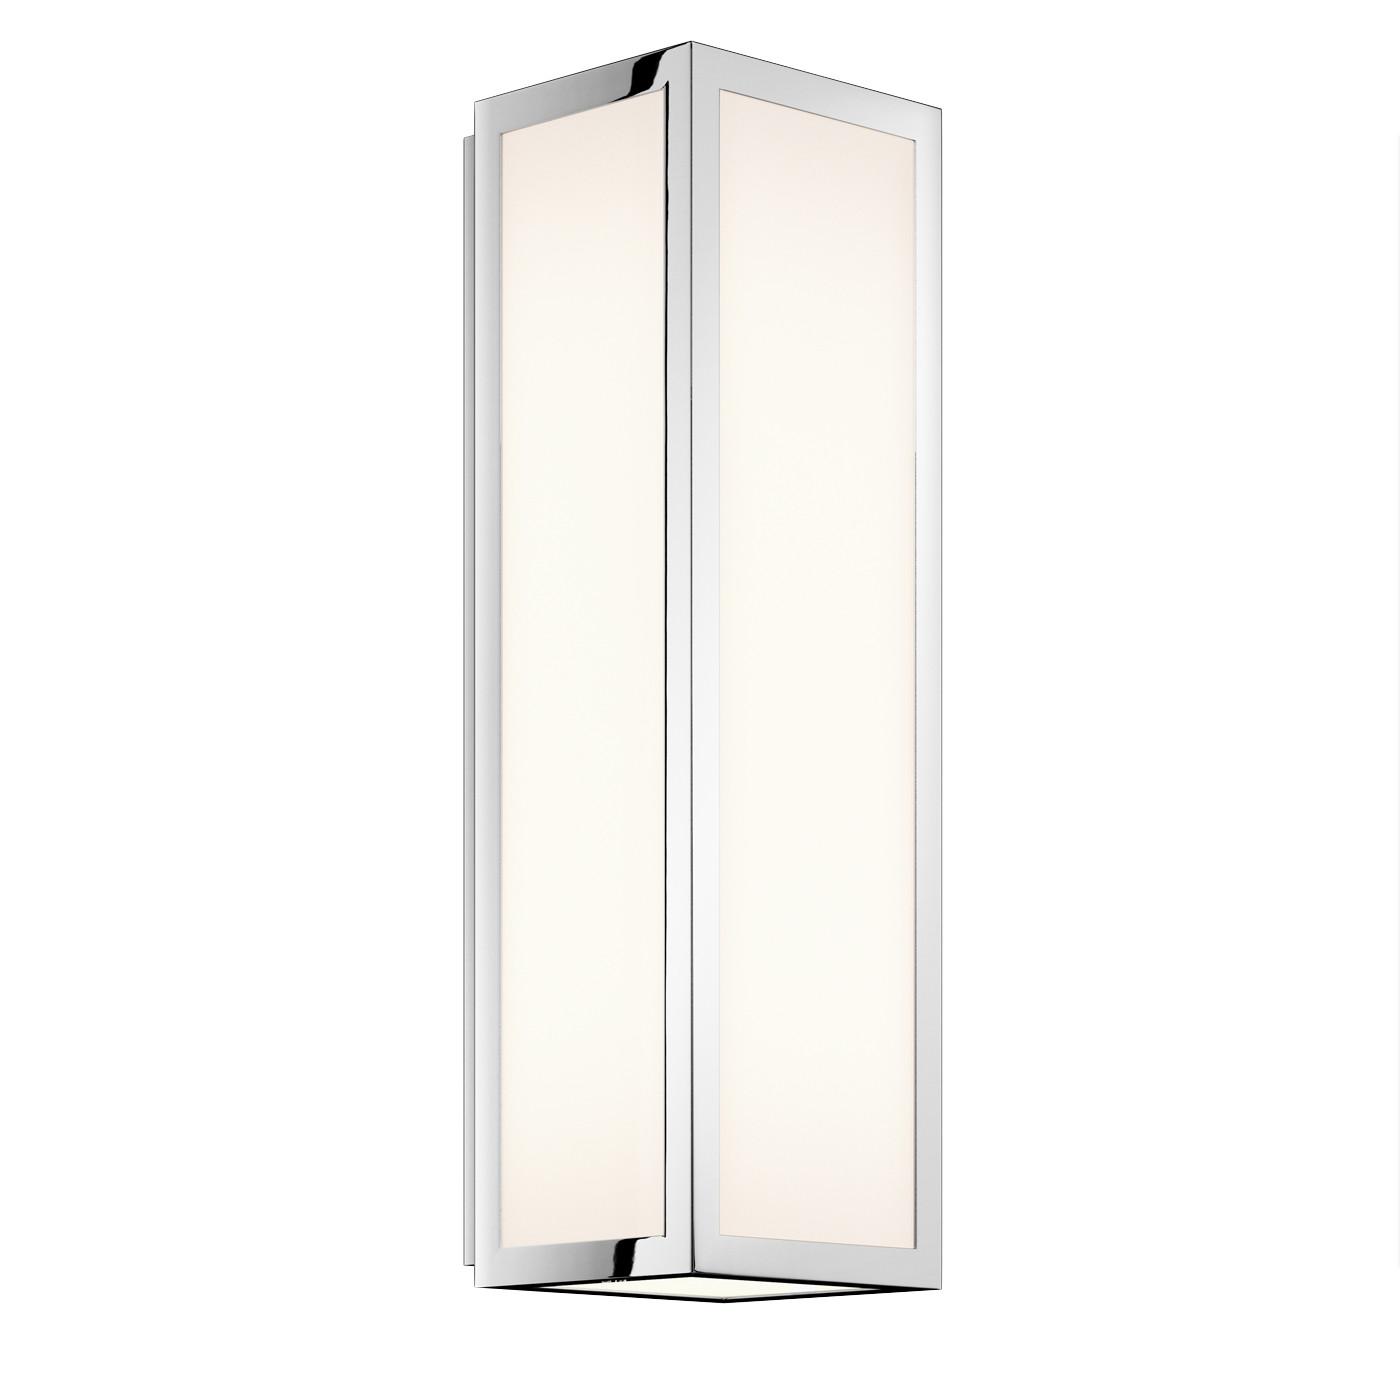 Decor Walther Bauhaus 1 N Wall Light